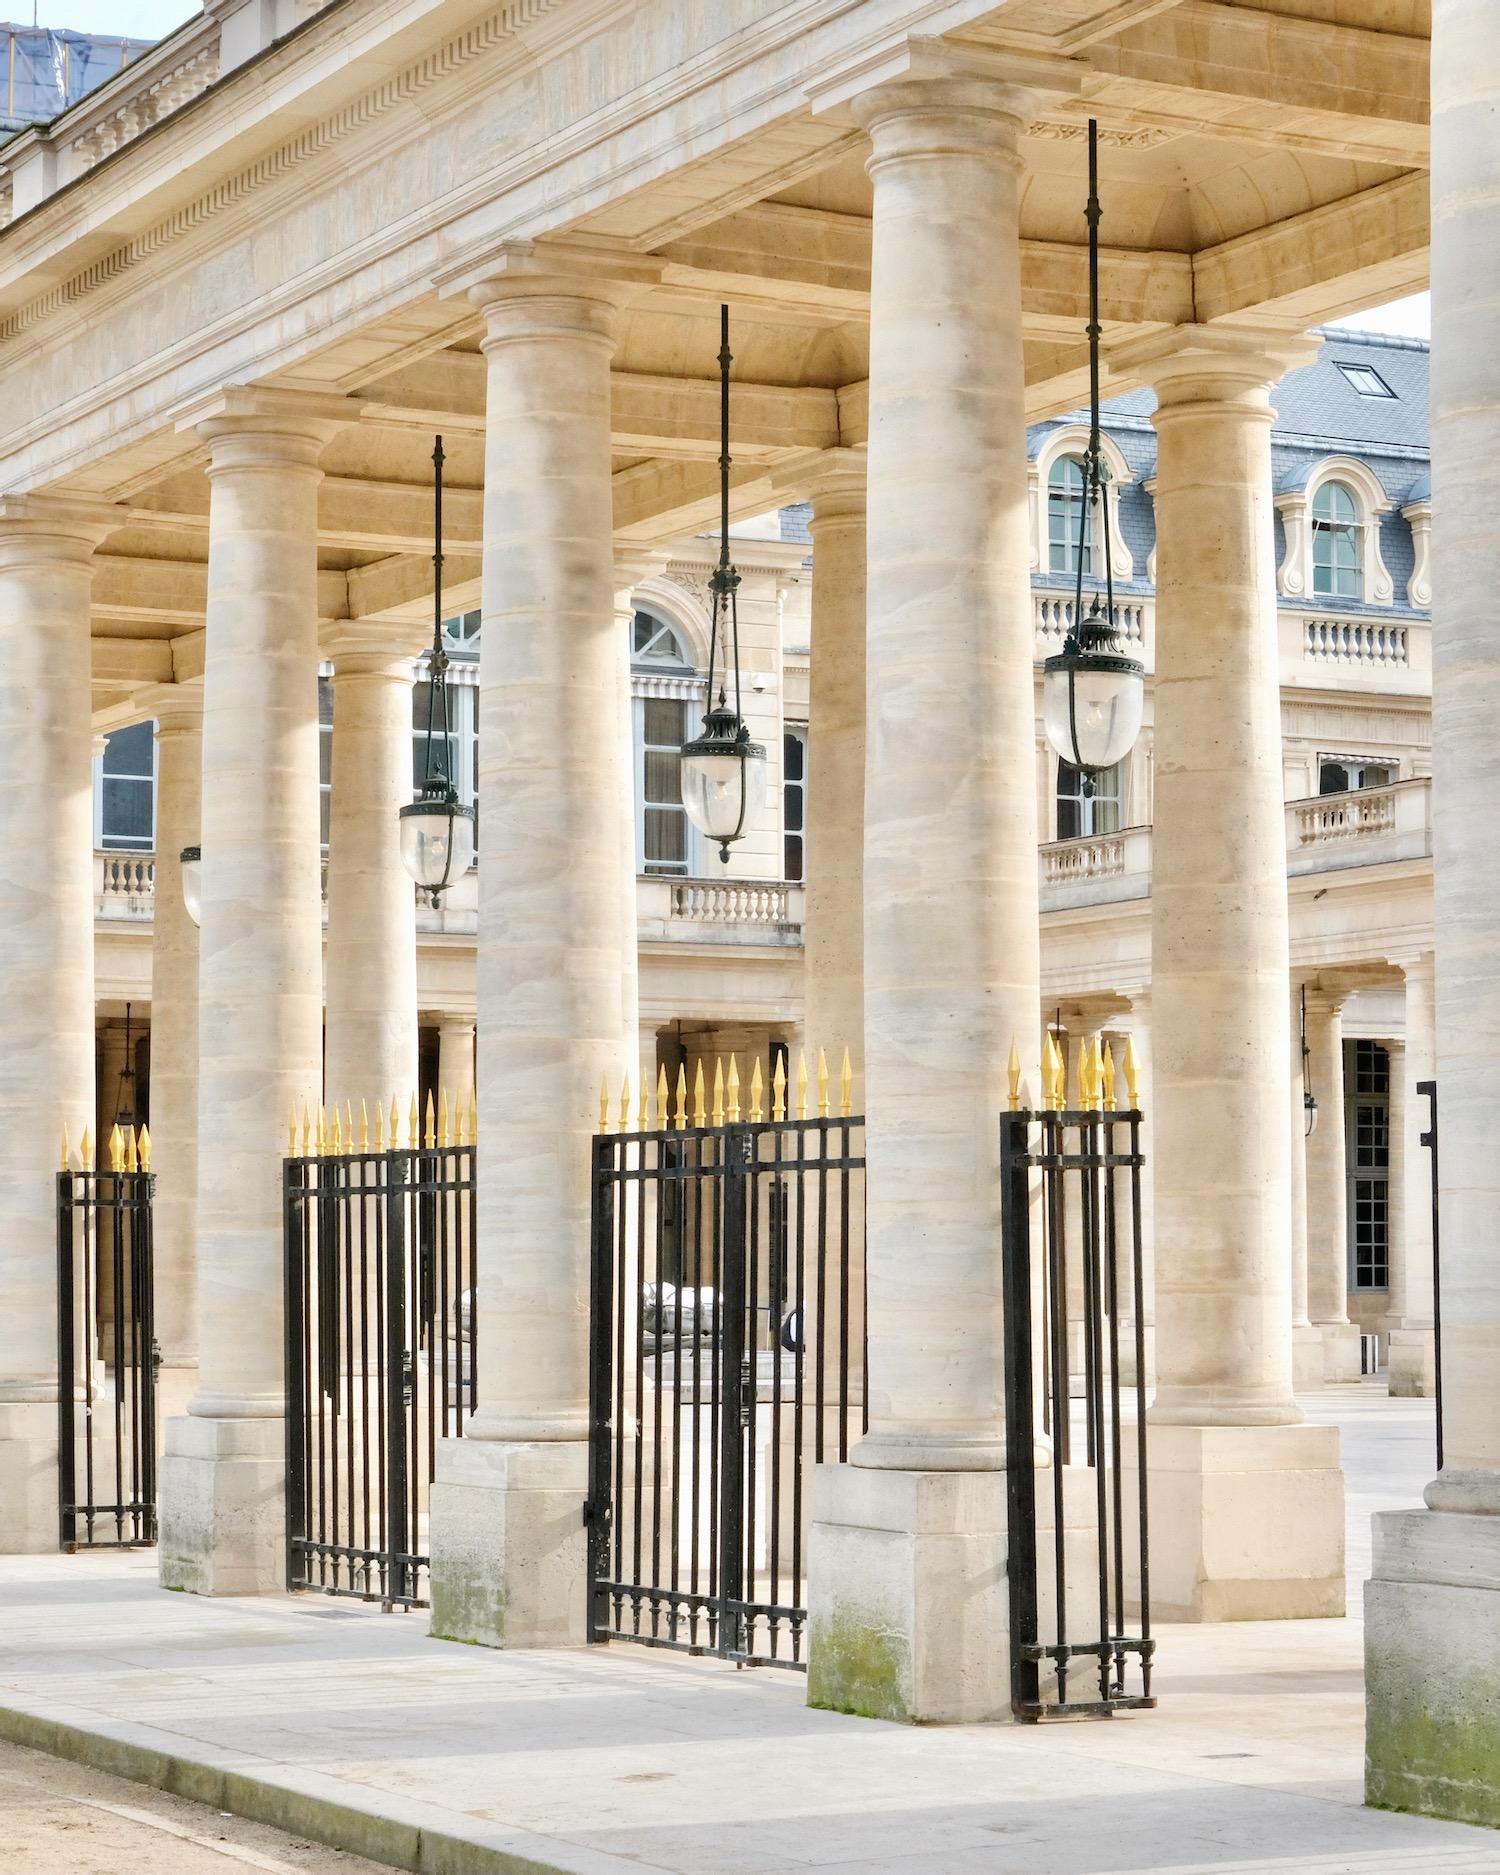 palais royal columns february